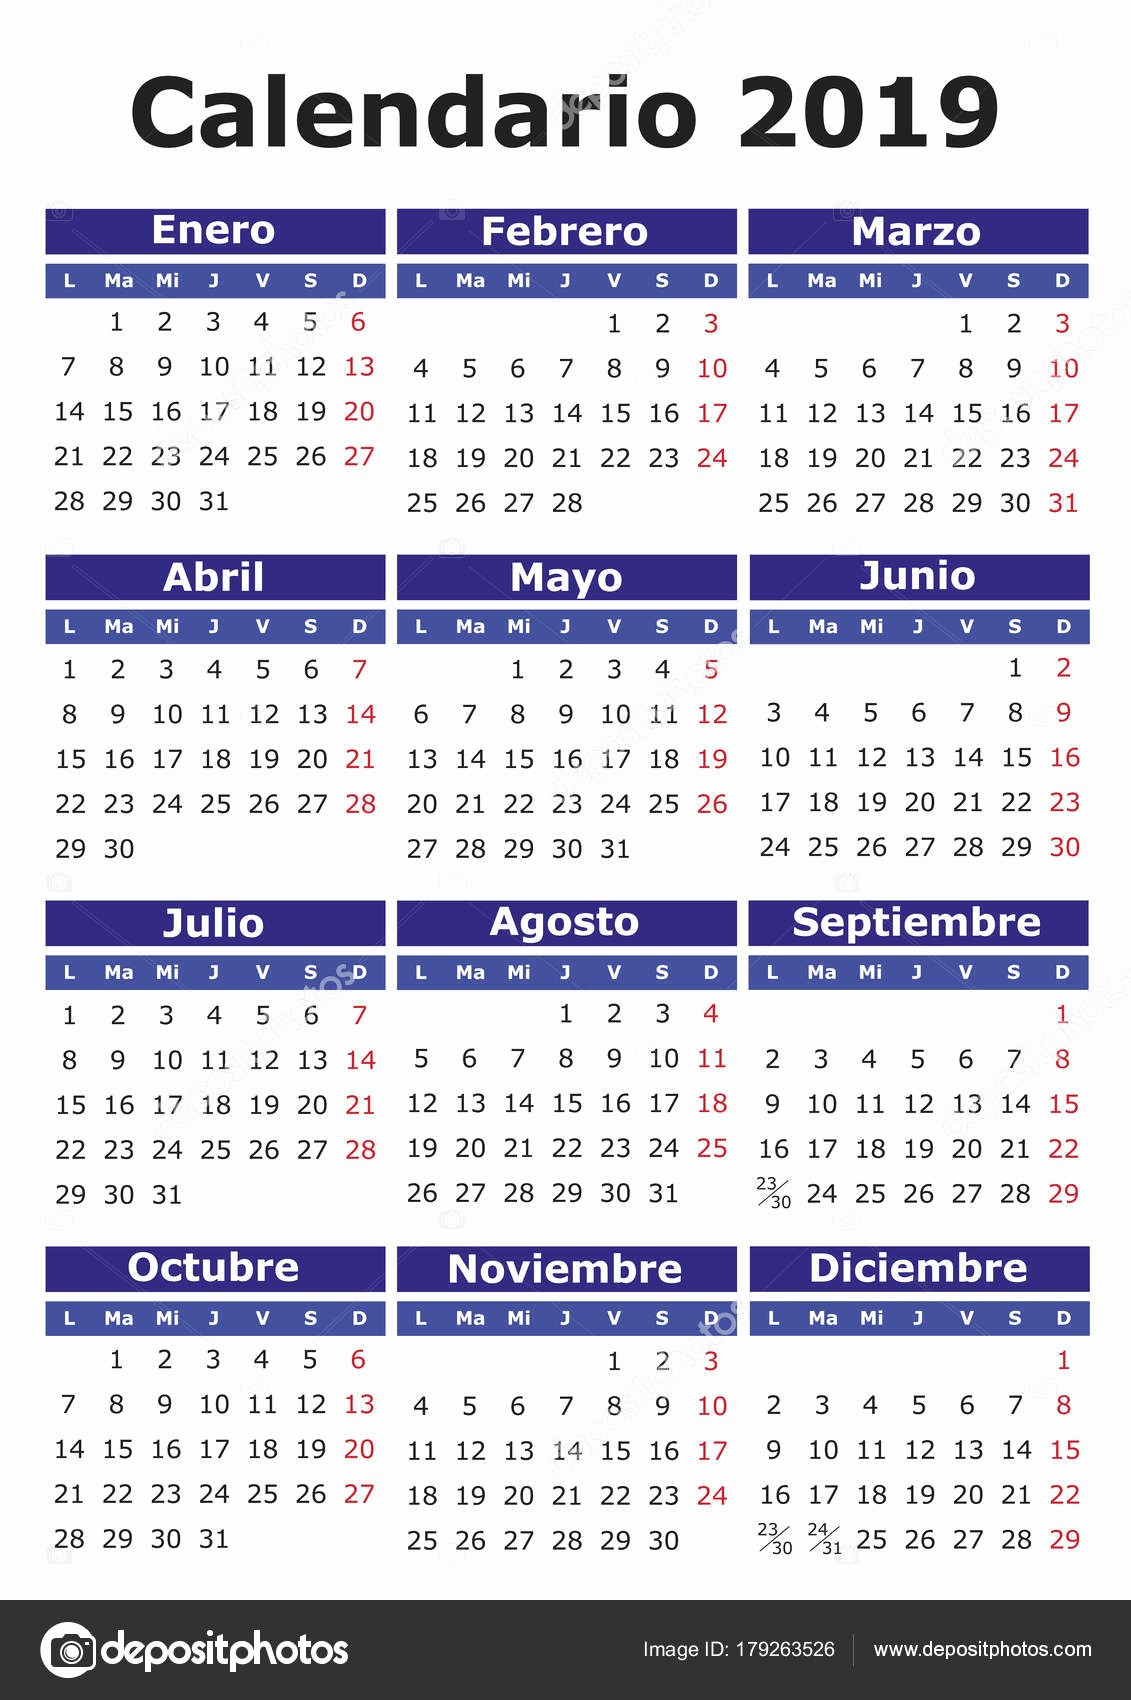 Calendario E2019 Espanhol Calendario 2019 Vetores De Stock